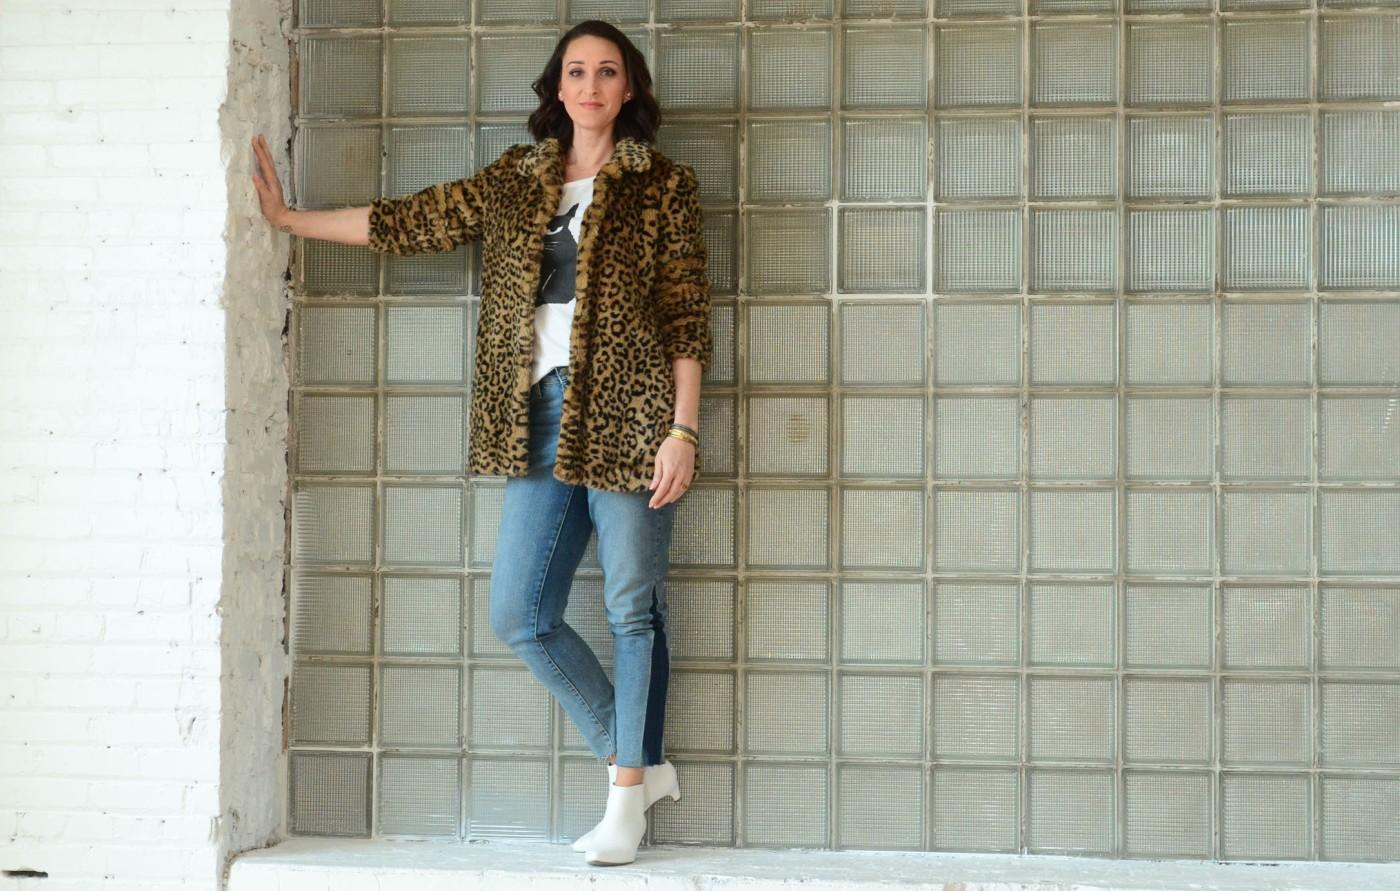 women-i-work-with-kristin-schroeder-leopard-fur-coat-cat-tee-denim-white-boots